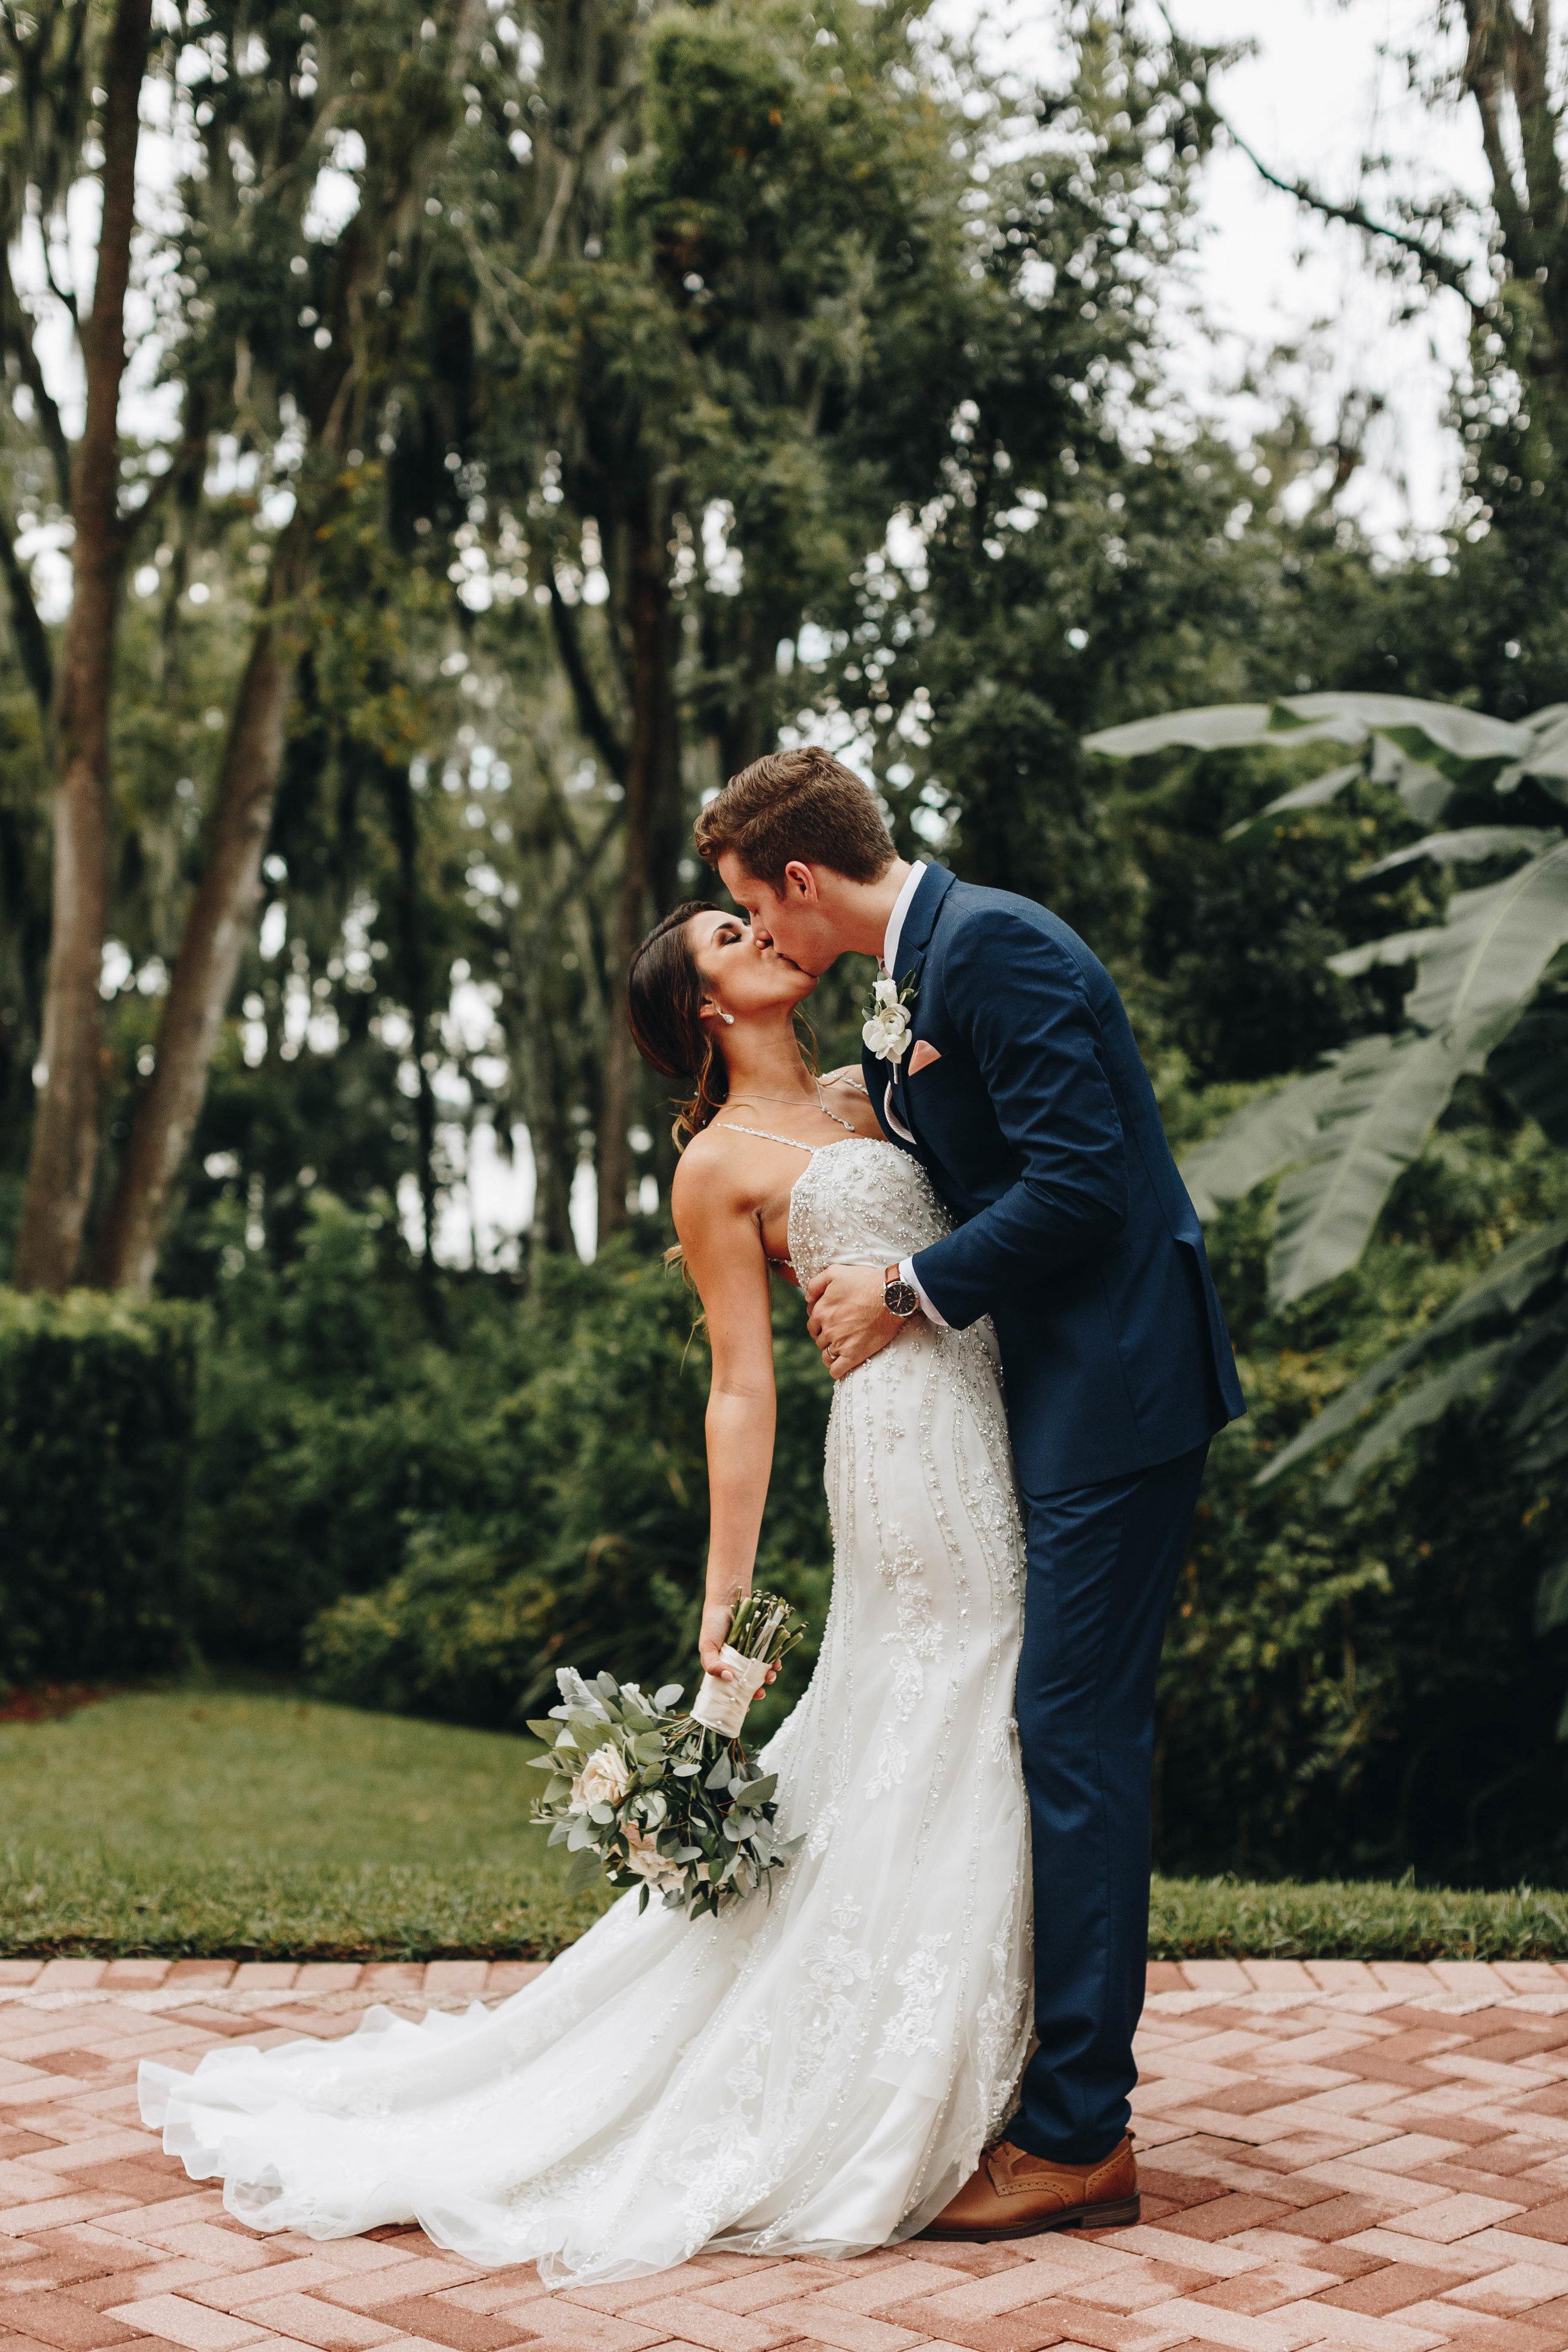 2c7ce-luxmoregrandestatewedding.jpgluxmoregrandestatewedding.jpg